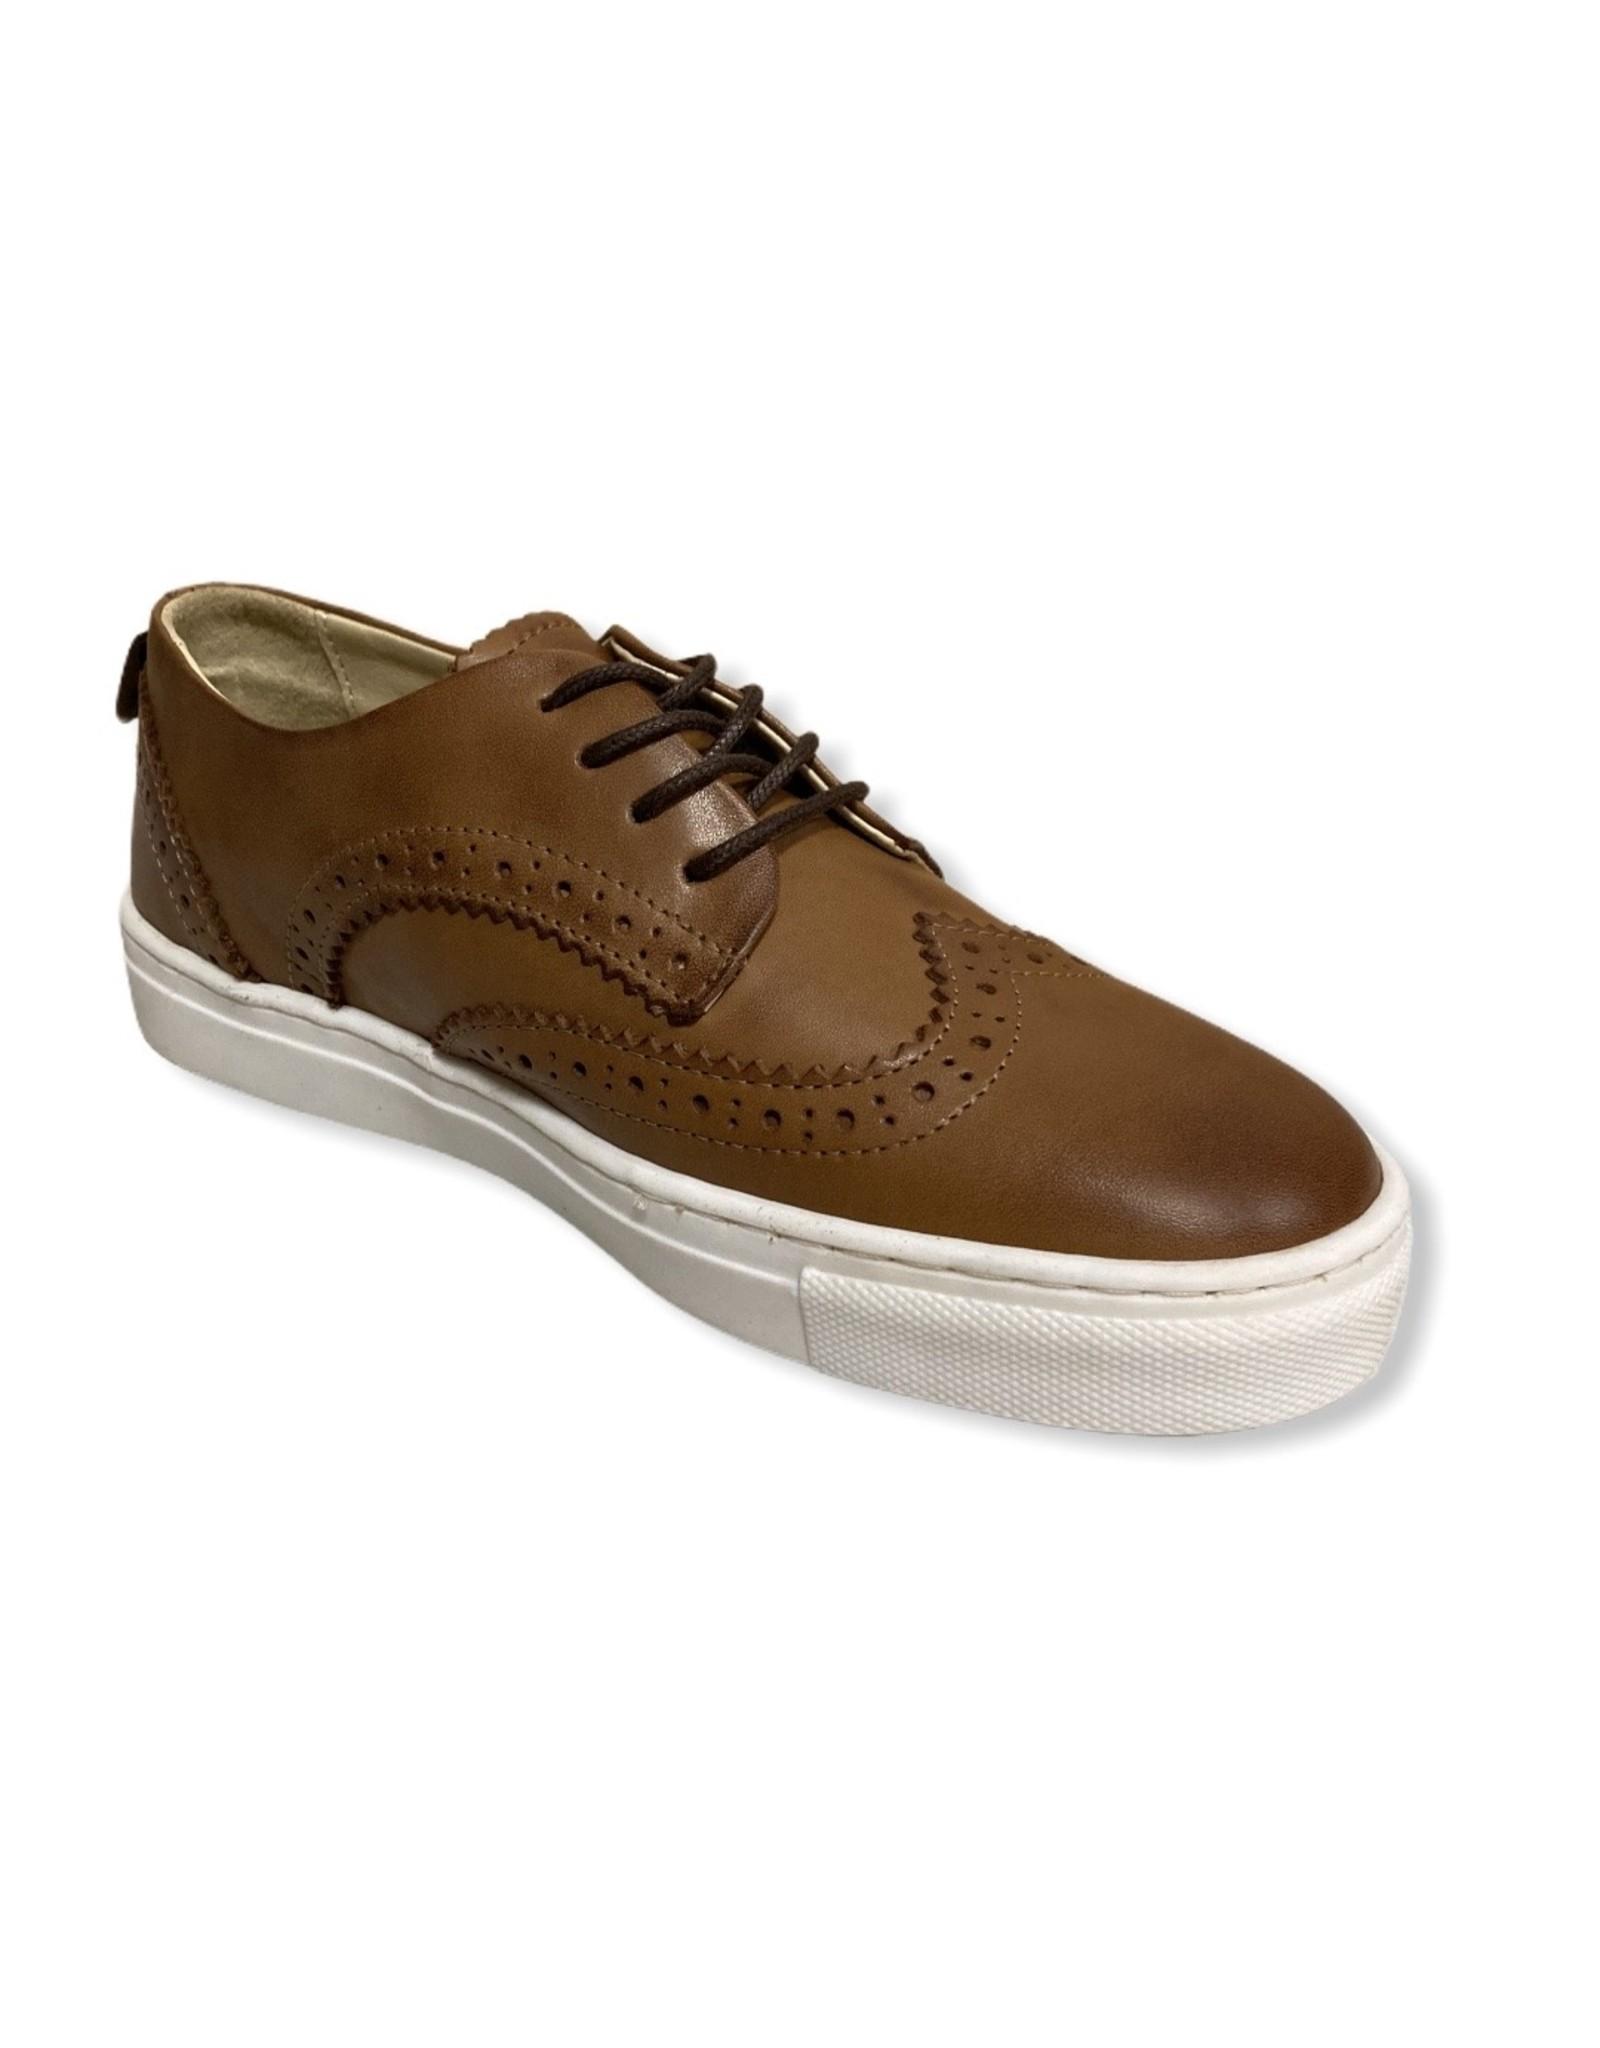 Young Soles Oscar camel shoe